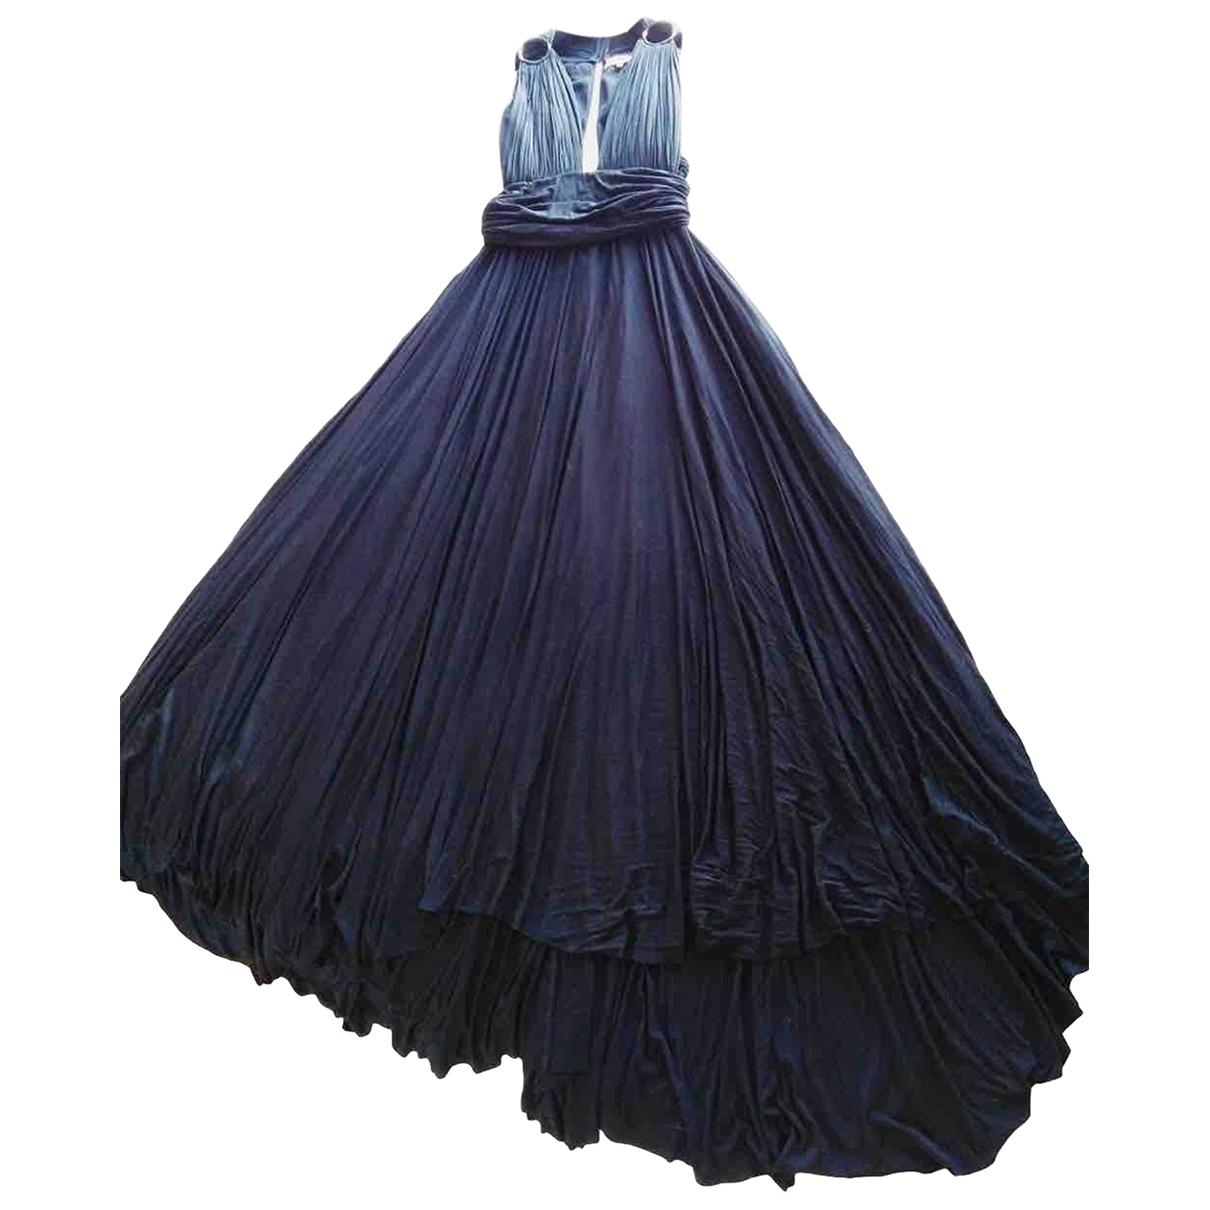 Maria Lucia Hohan \N Kleid in  Schwarz Baumwolle - Elasthan